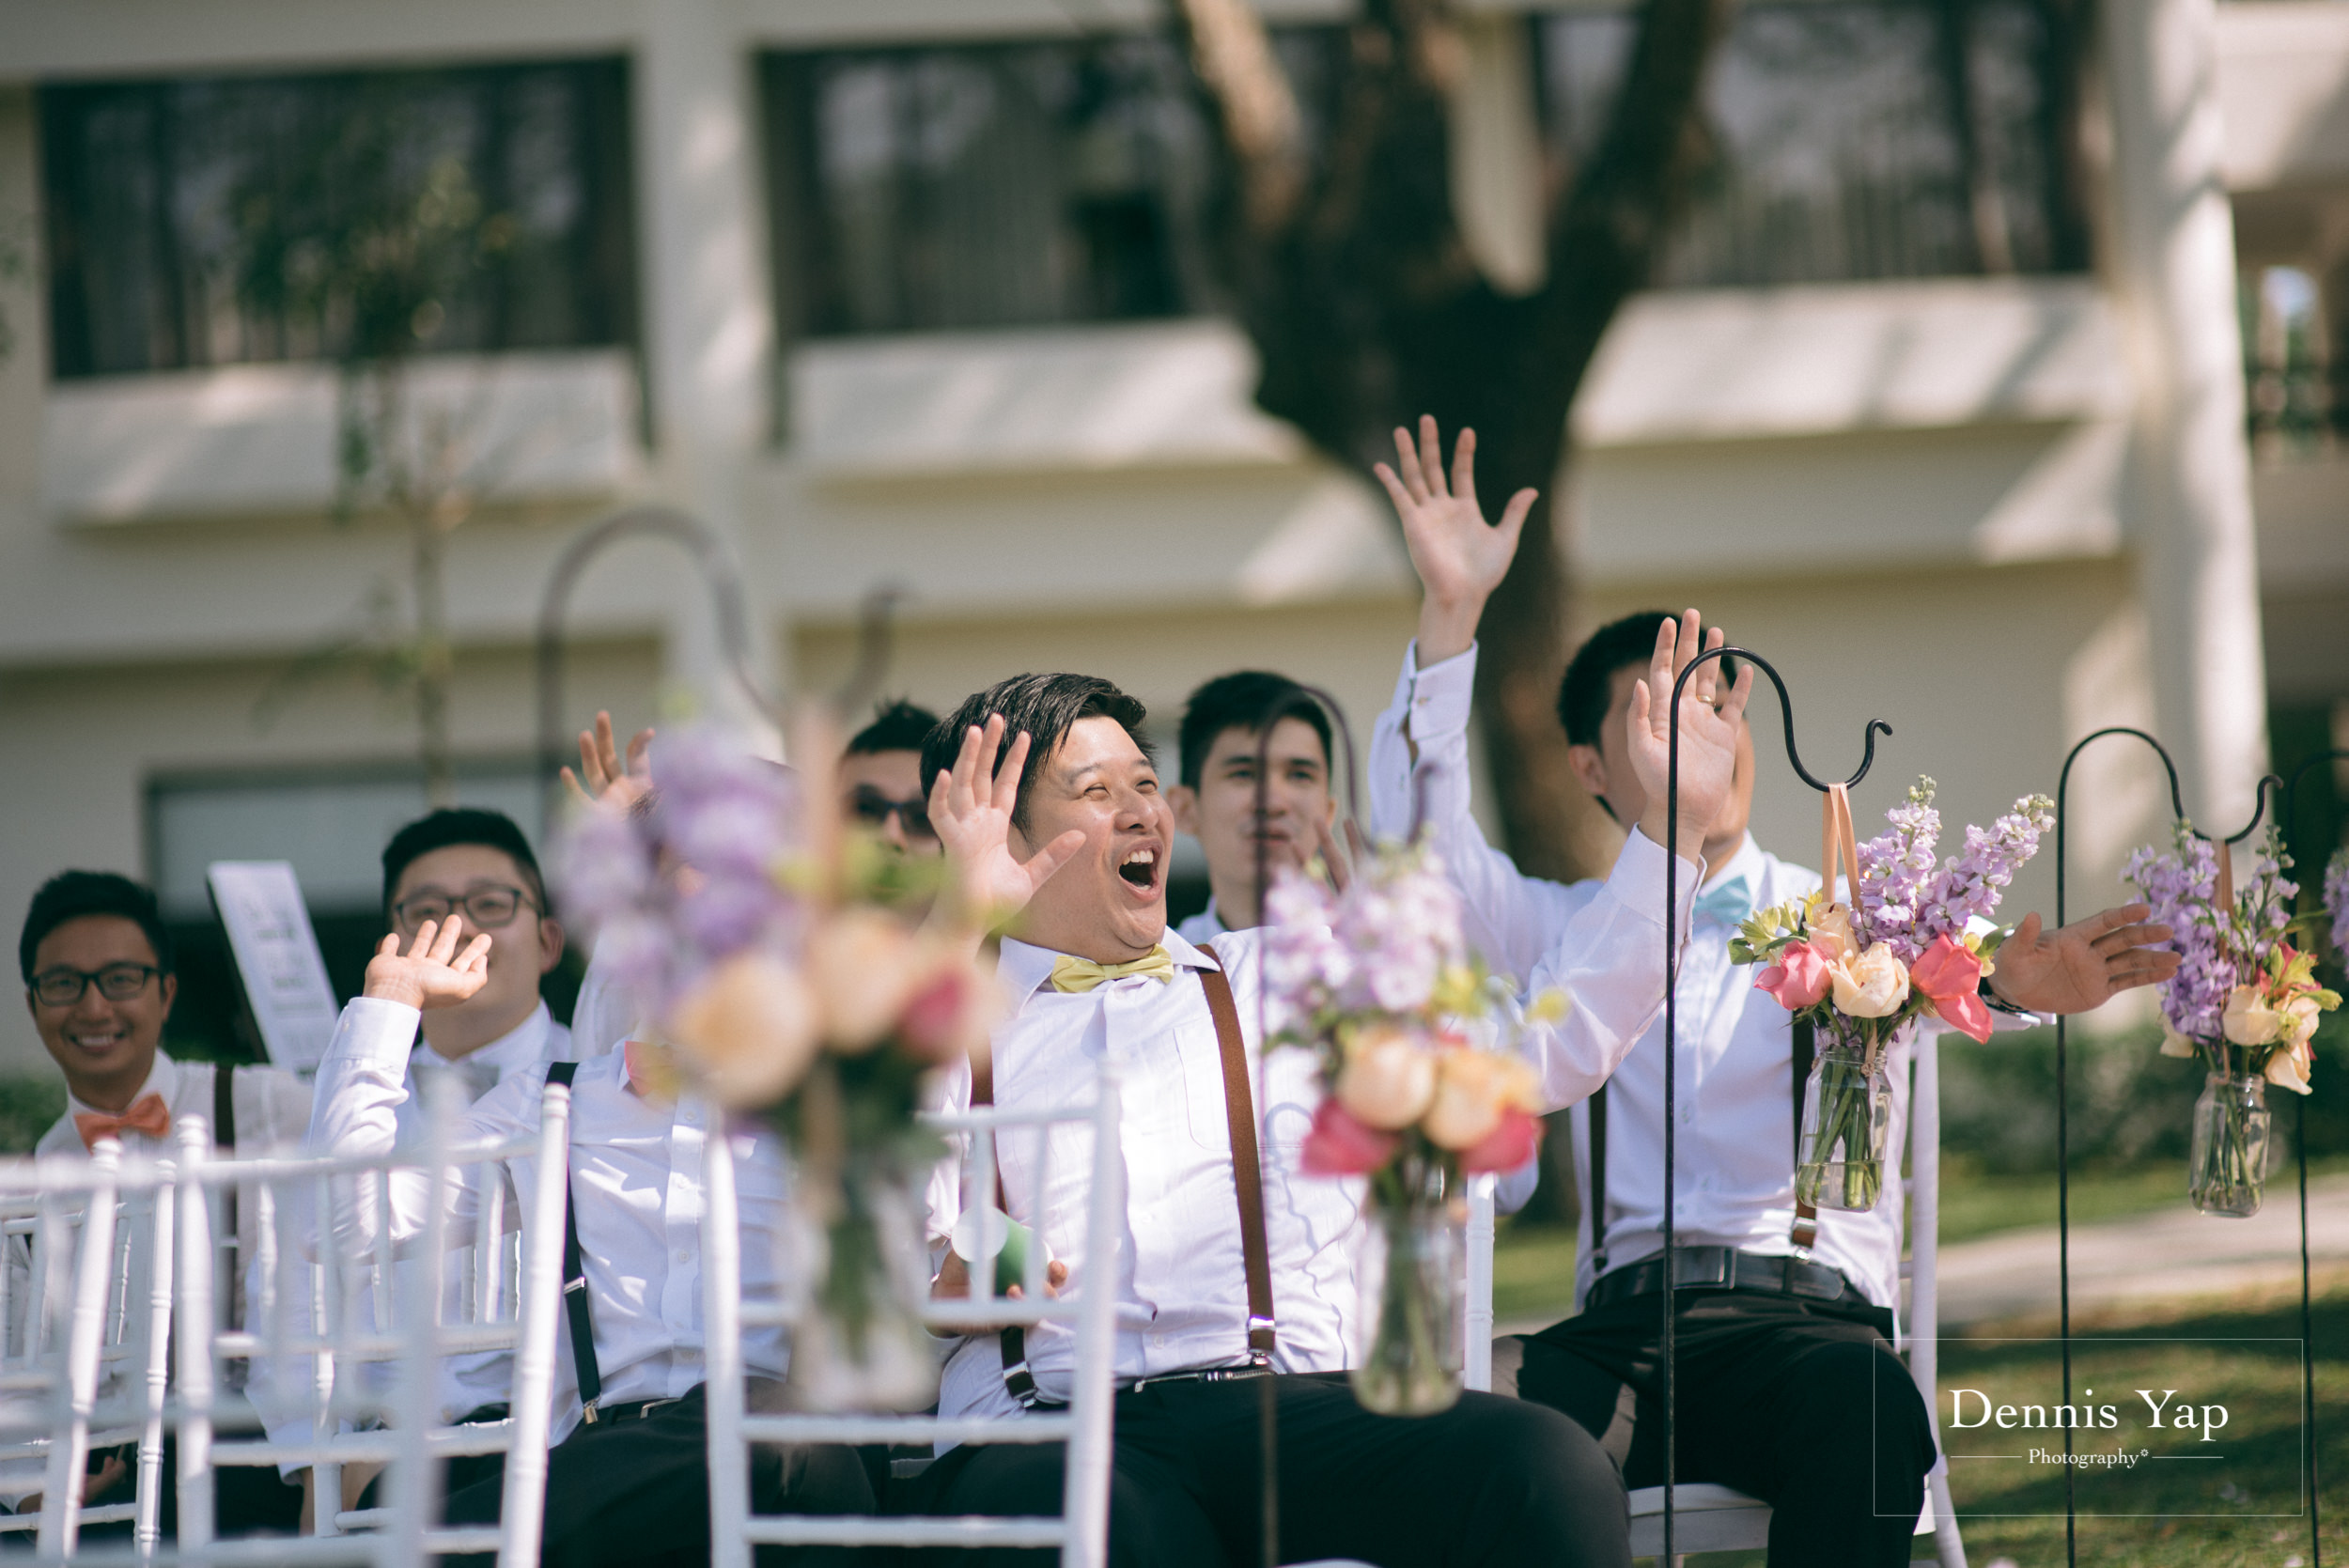 taylai cheng yee garden wedding saujana hotel subang jaya dennis yap photography sunlight-23.jpg